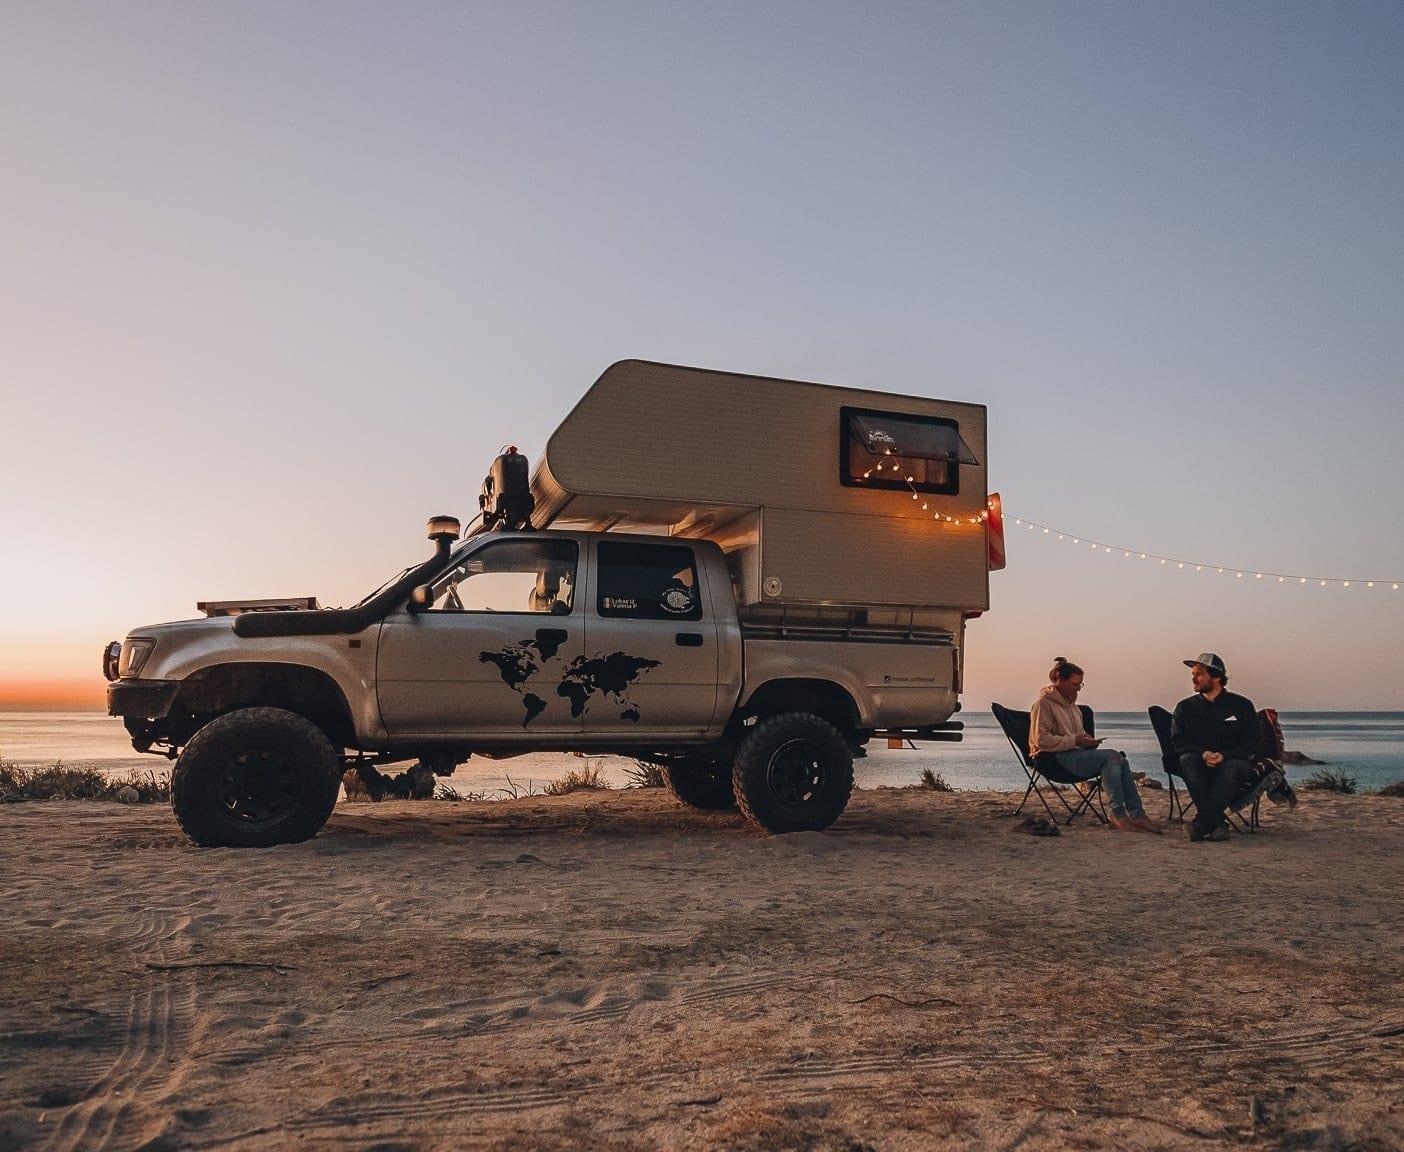 toyota-hilux-ln-105-camper-pickup-vanlife-kaufen-ausbau-3